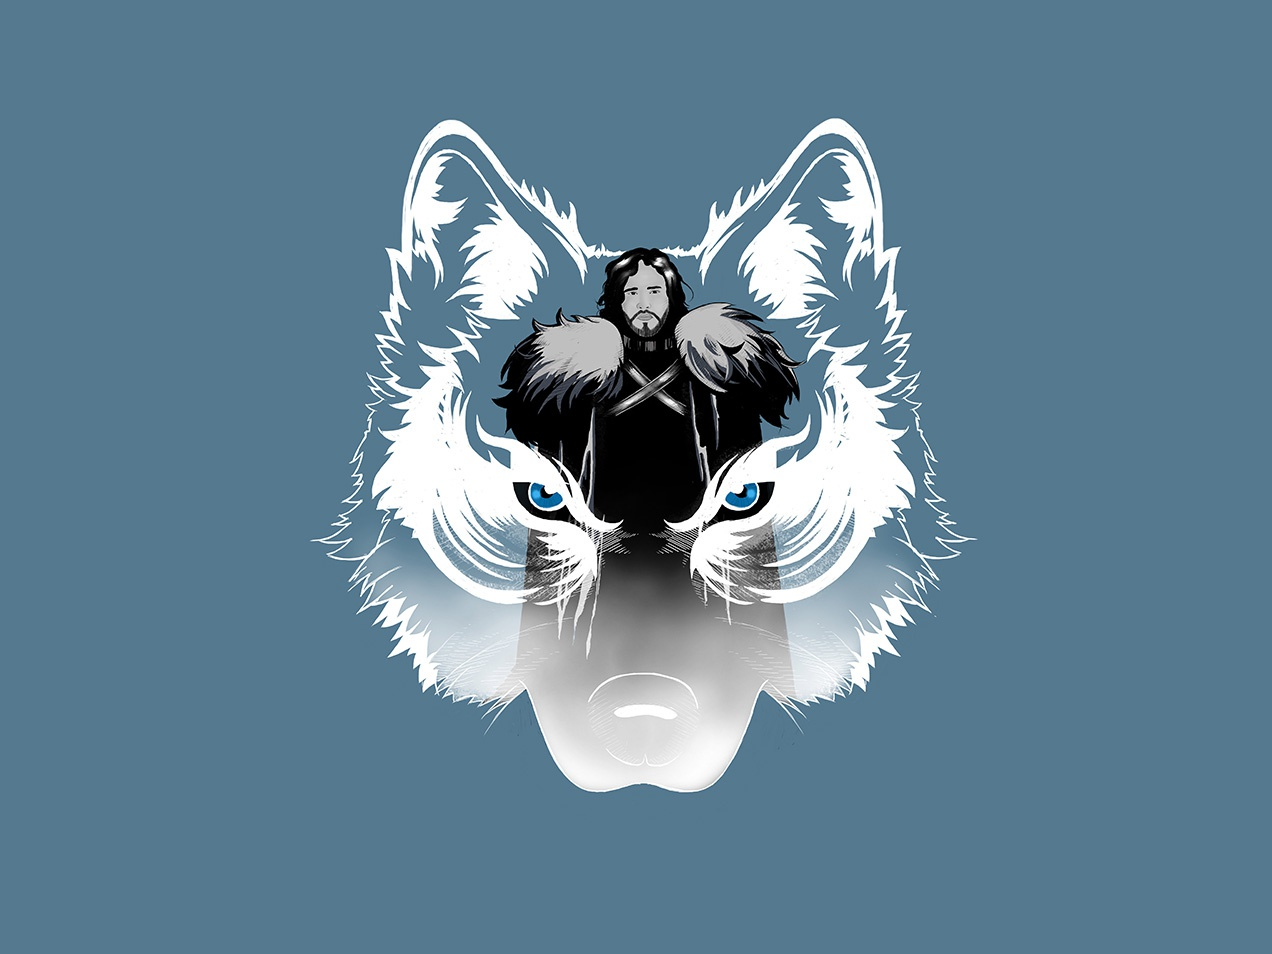 Jon Snow stark king in the north character design artwork game of thrones illustration jon snow